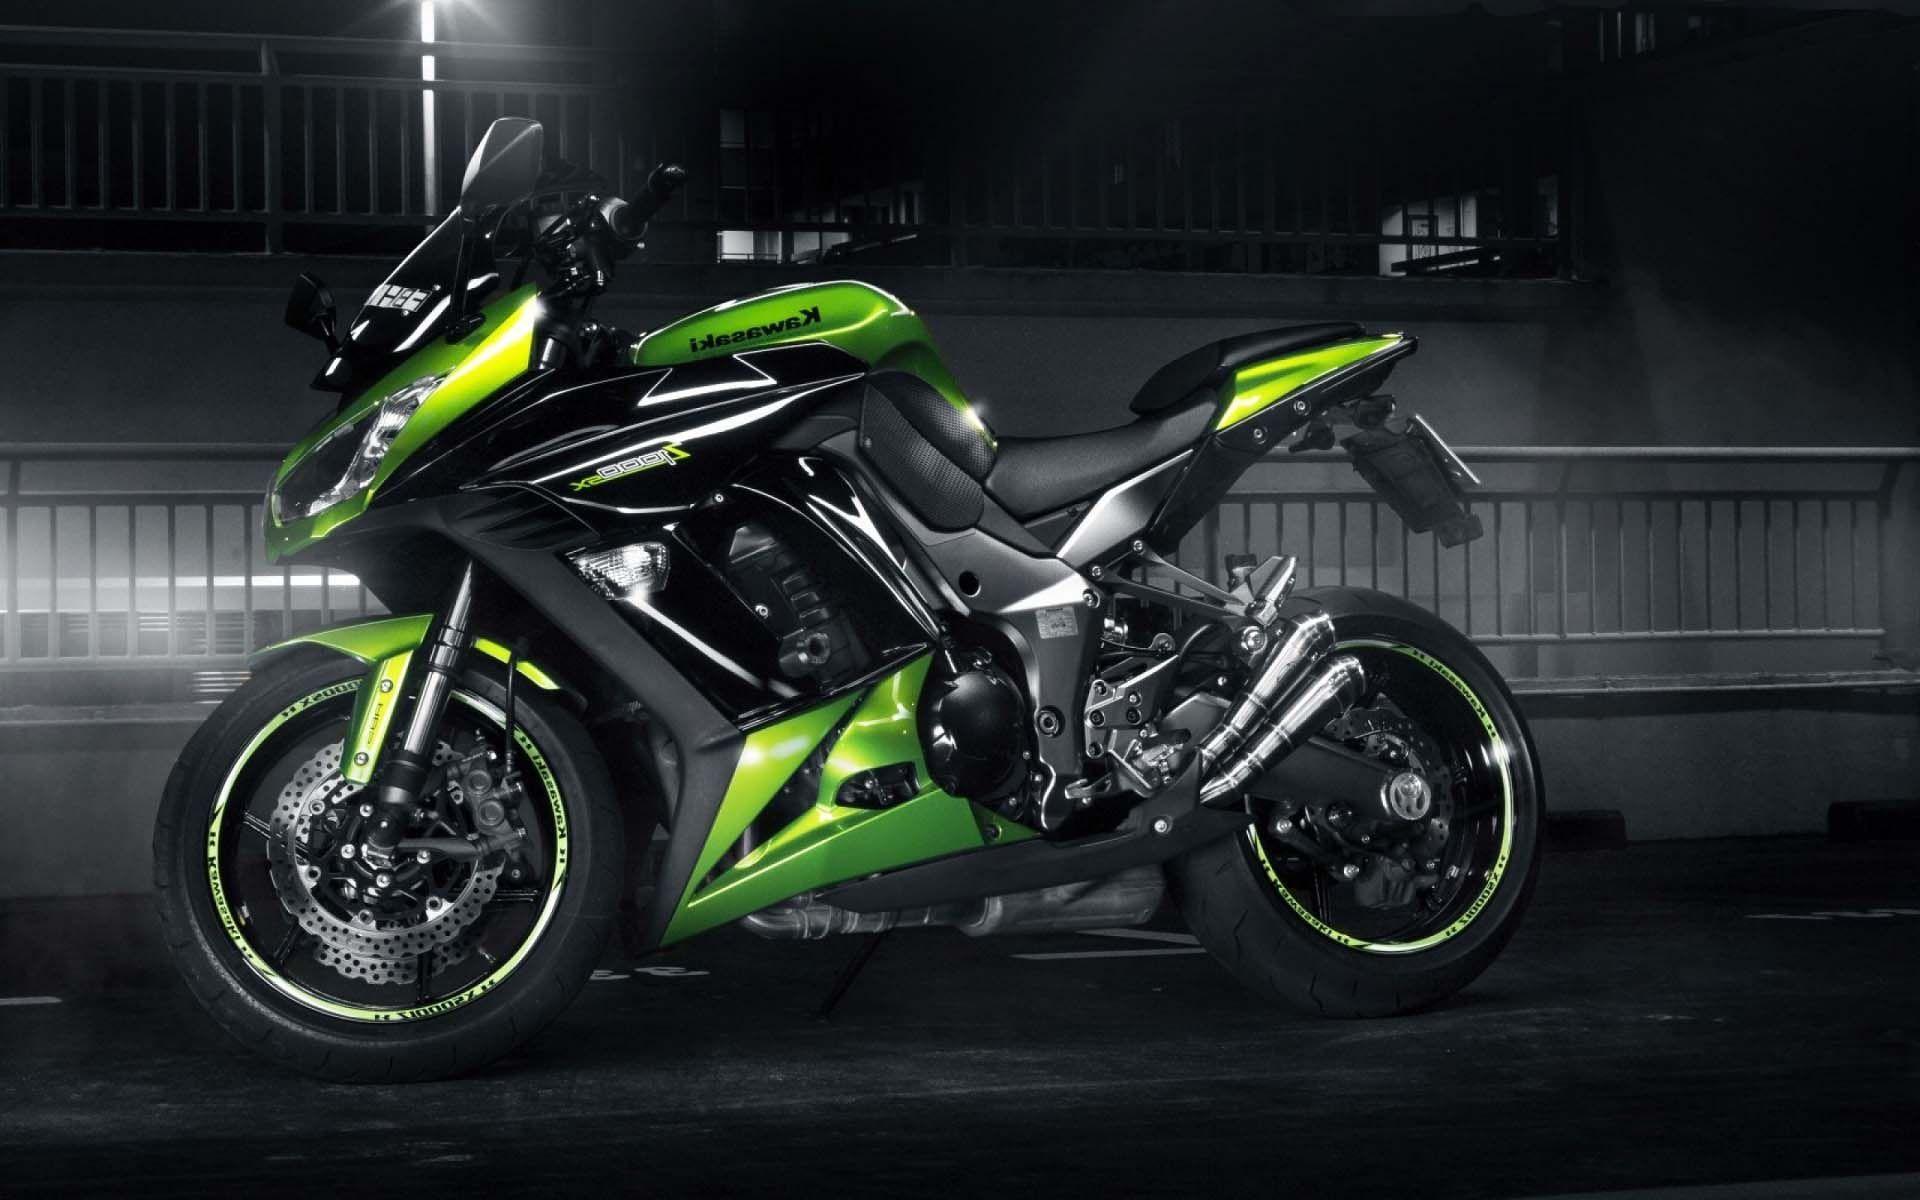 Kawasaki Ninja Z1000 Moto Wallpaper